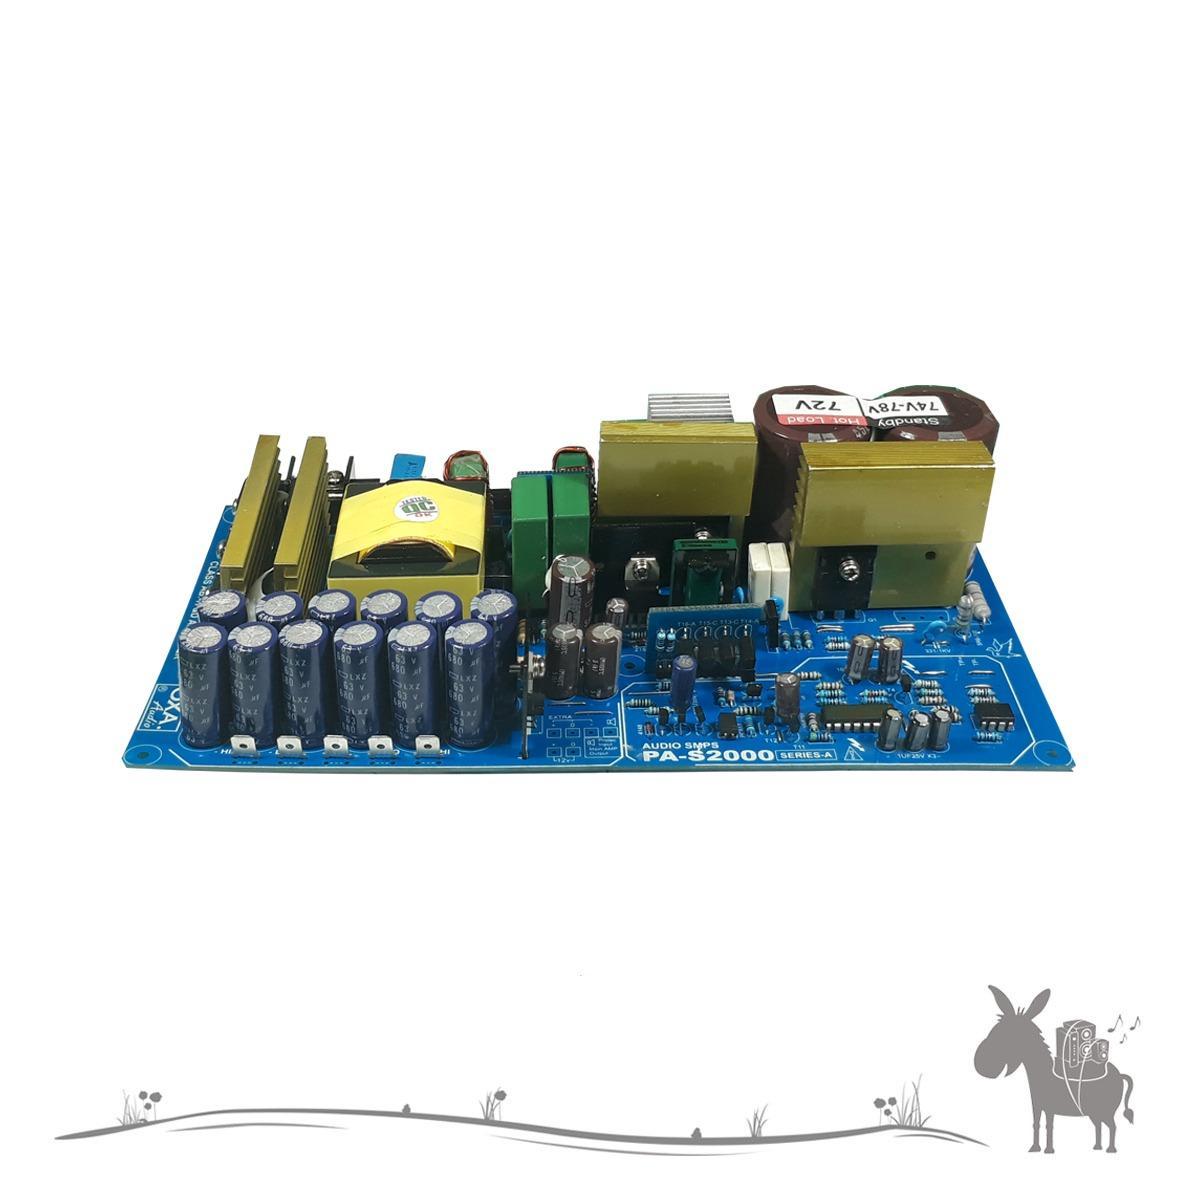 Promo Harga Power Supply Cctv 20 A Jaring Update 2018 Urban Living Wallpaper Sticker Ul 2104002 Classic Blue 53cm X 10m Kelebihan Kit Switching Smps 20a Ct 45 72v Terkini Detail